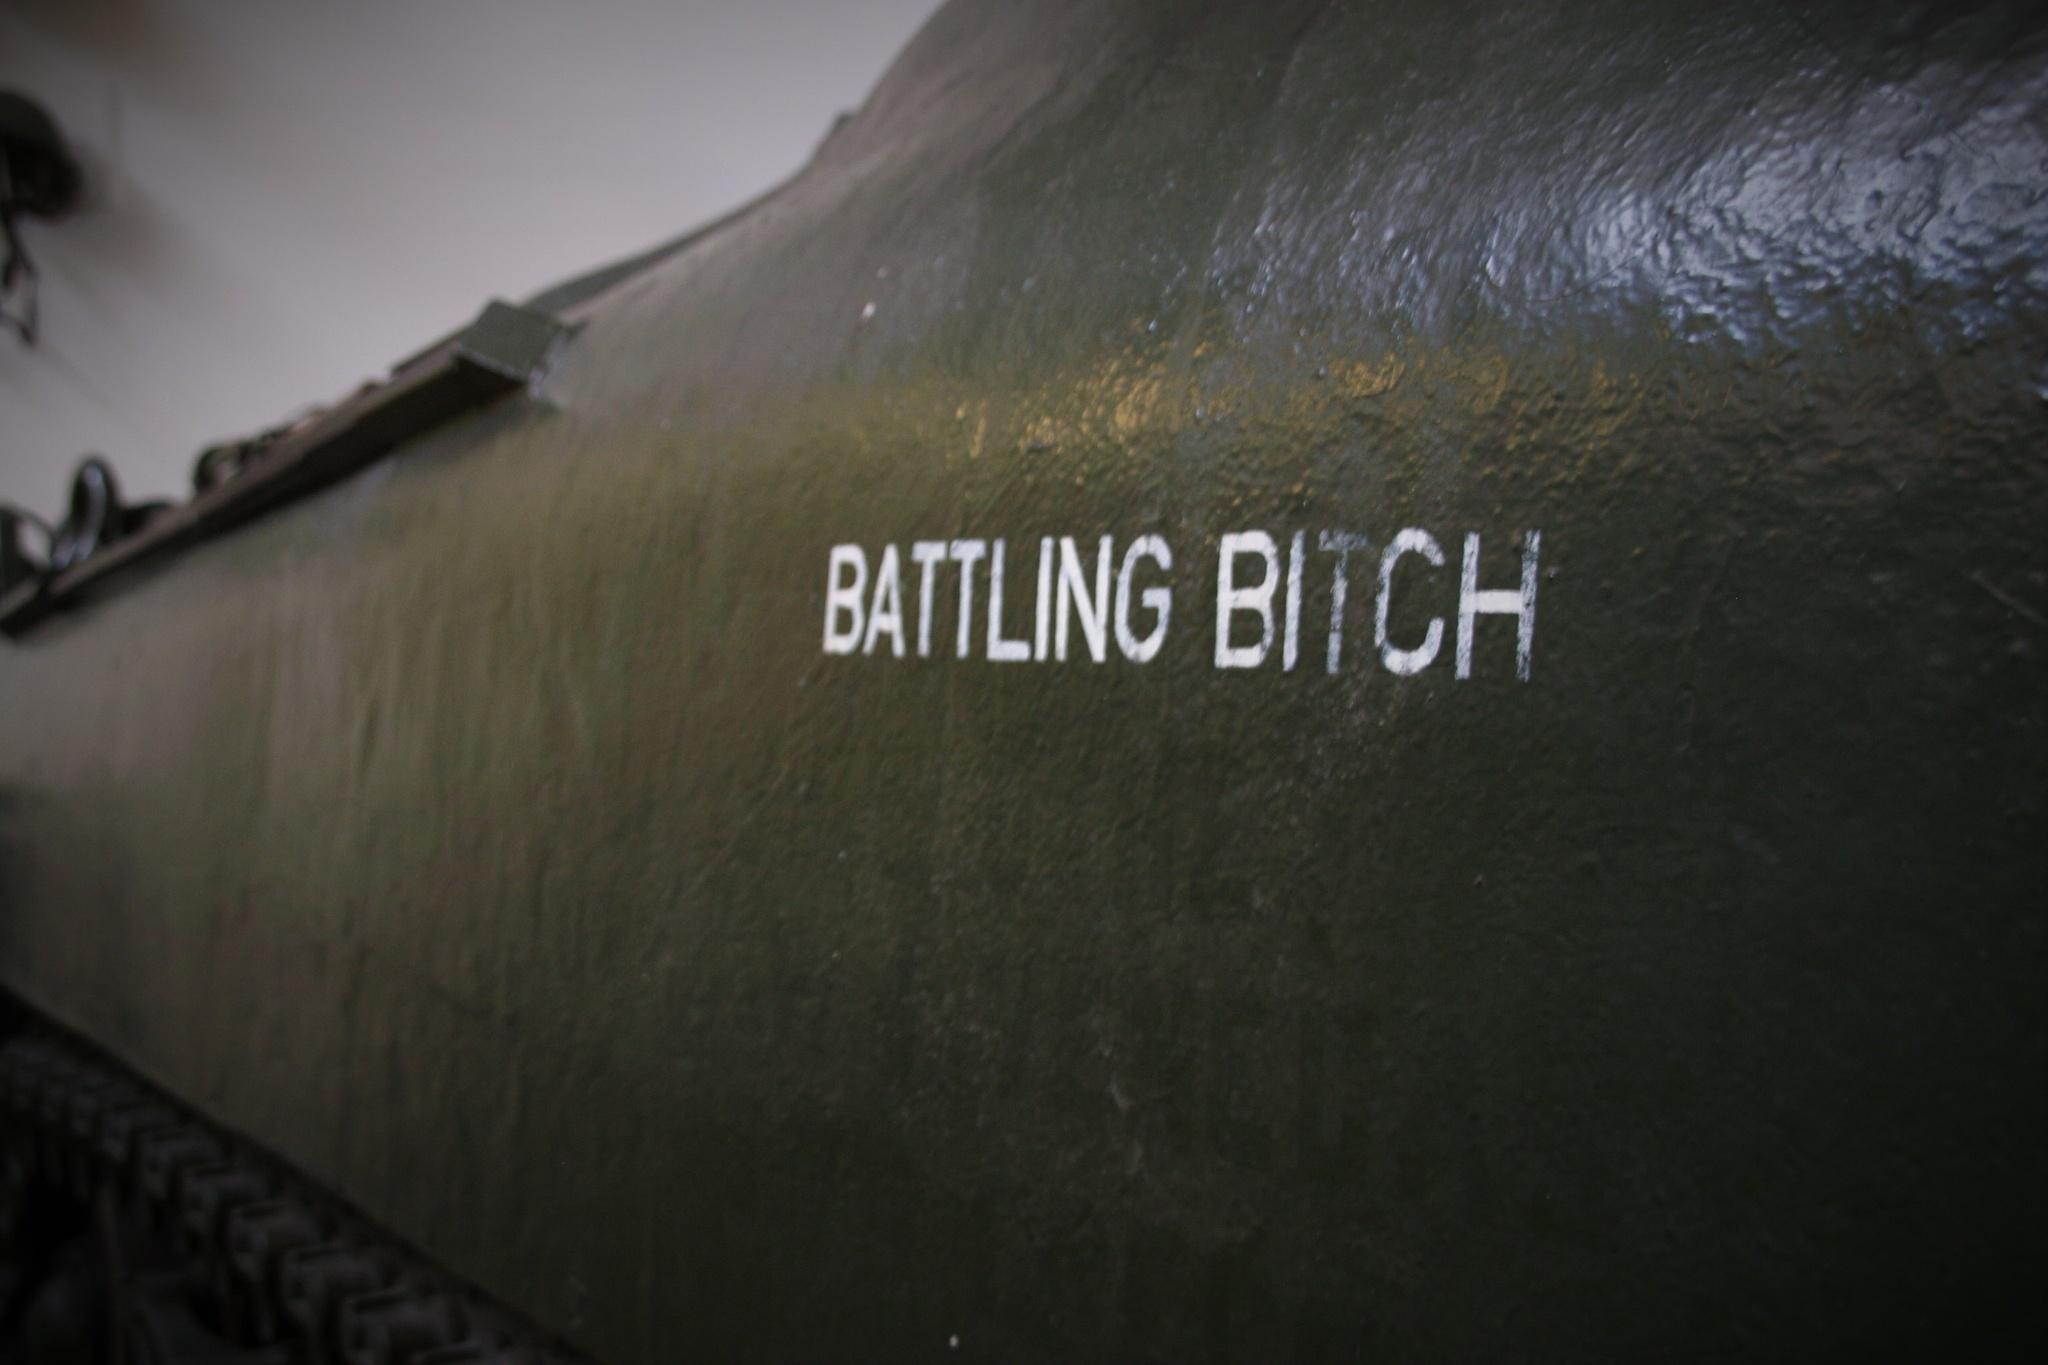 Battling bitch by Sovrano